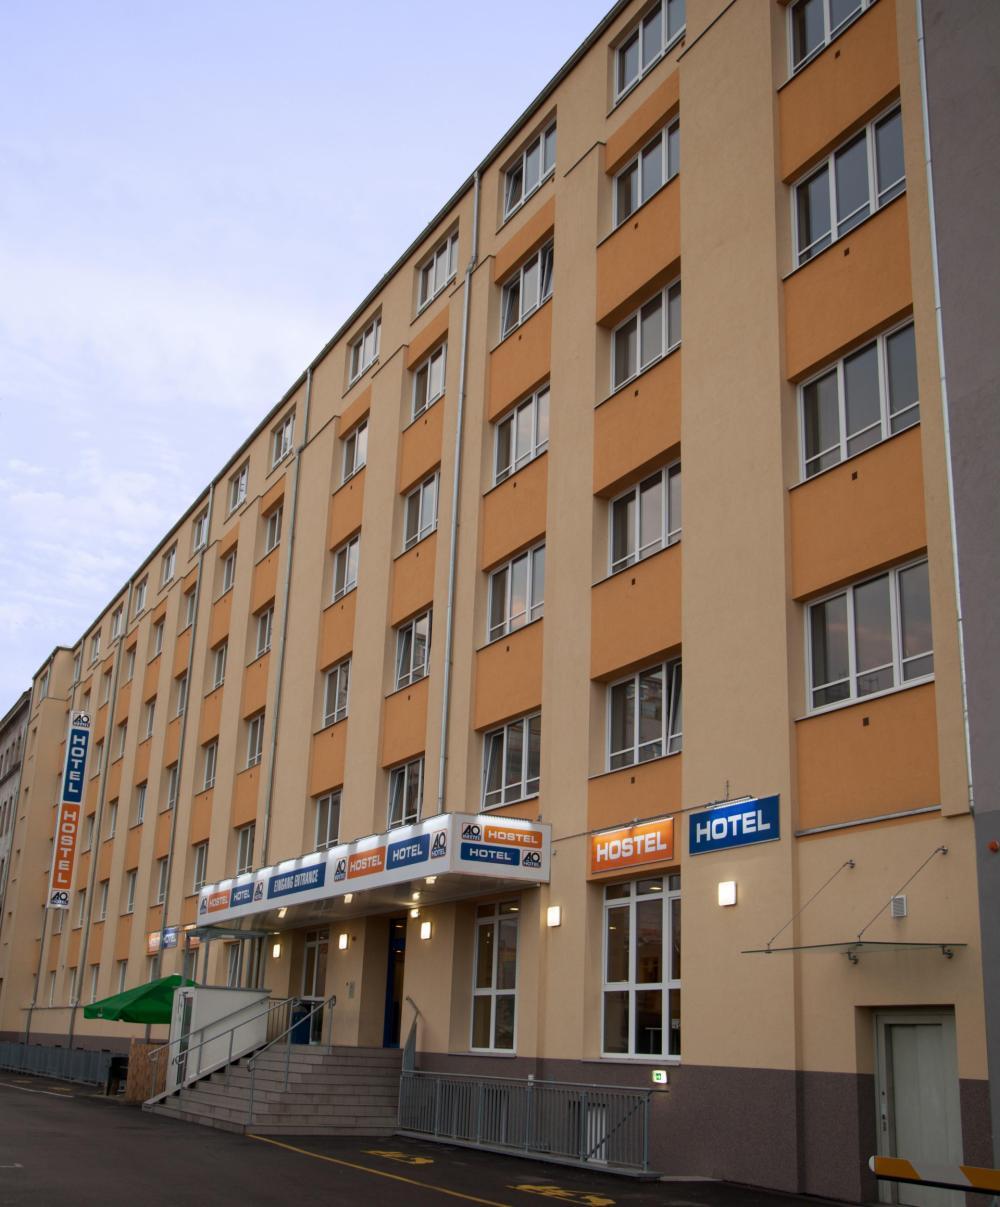 A&O Wien HB Hostel Gebäude